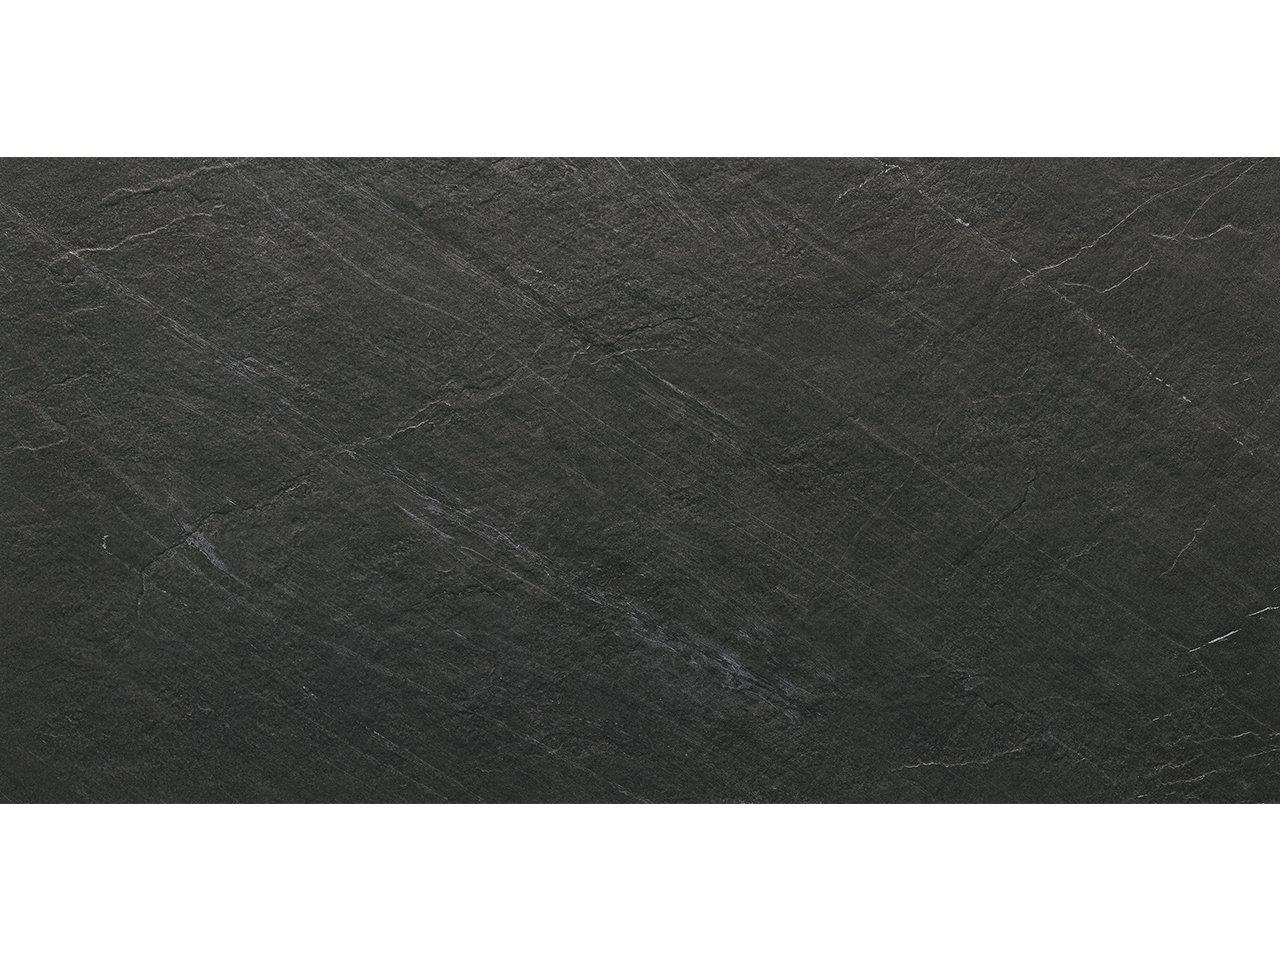 Piastrelle flottanti per esterni images pavimenti